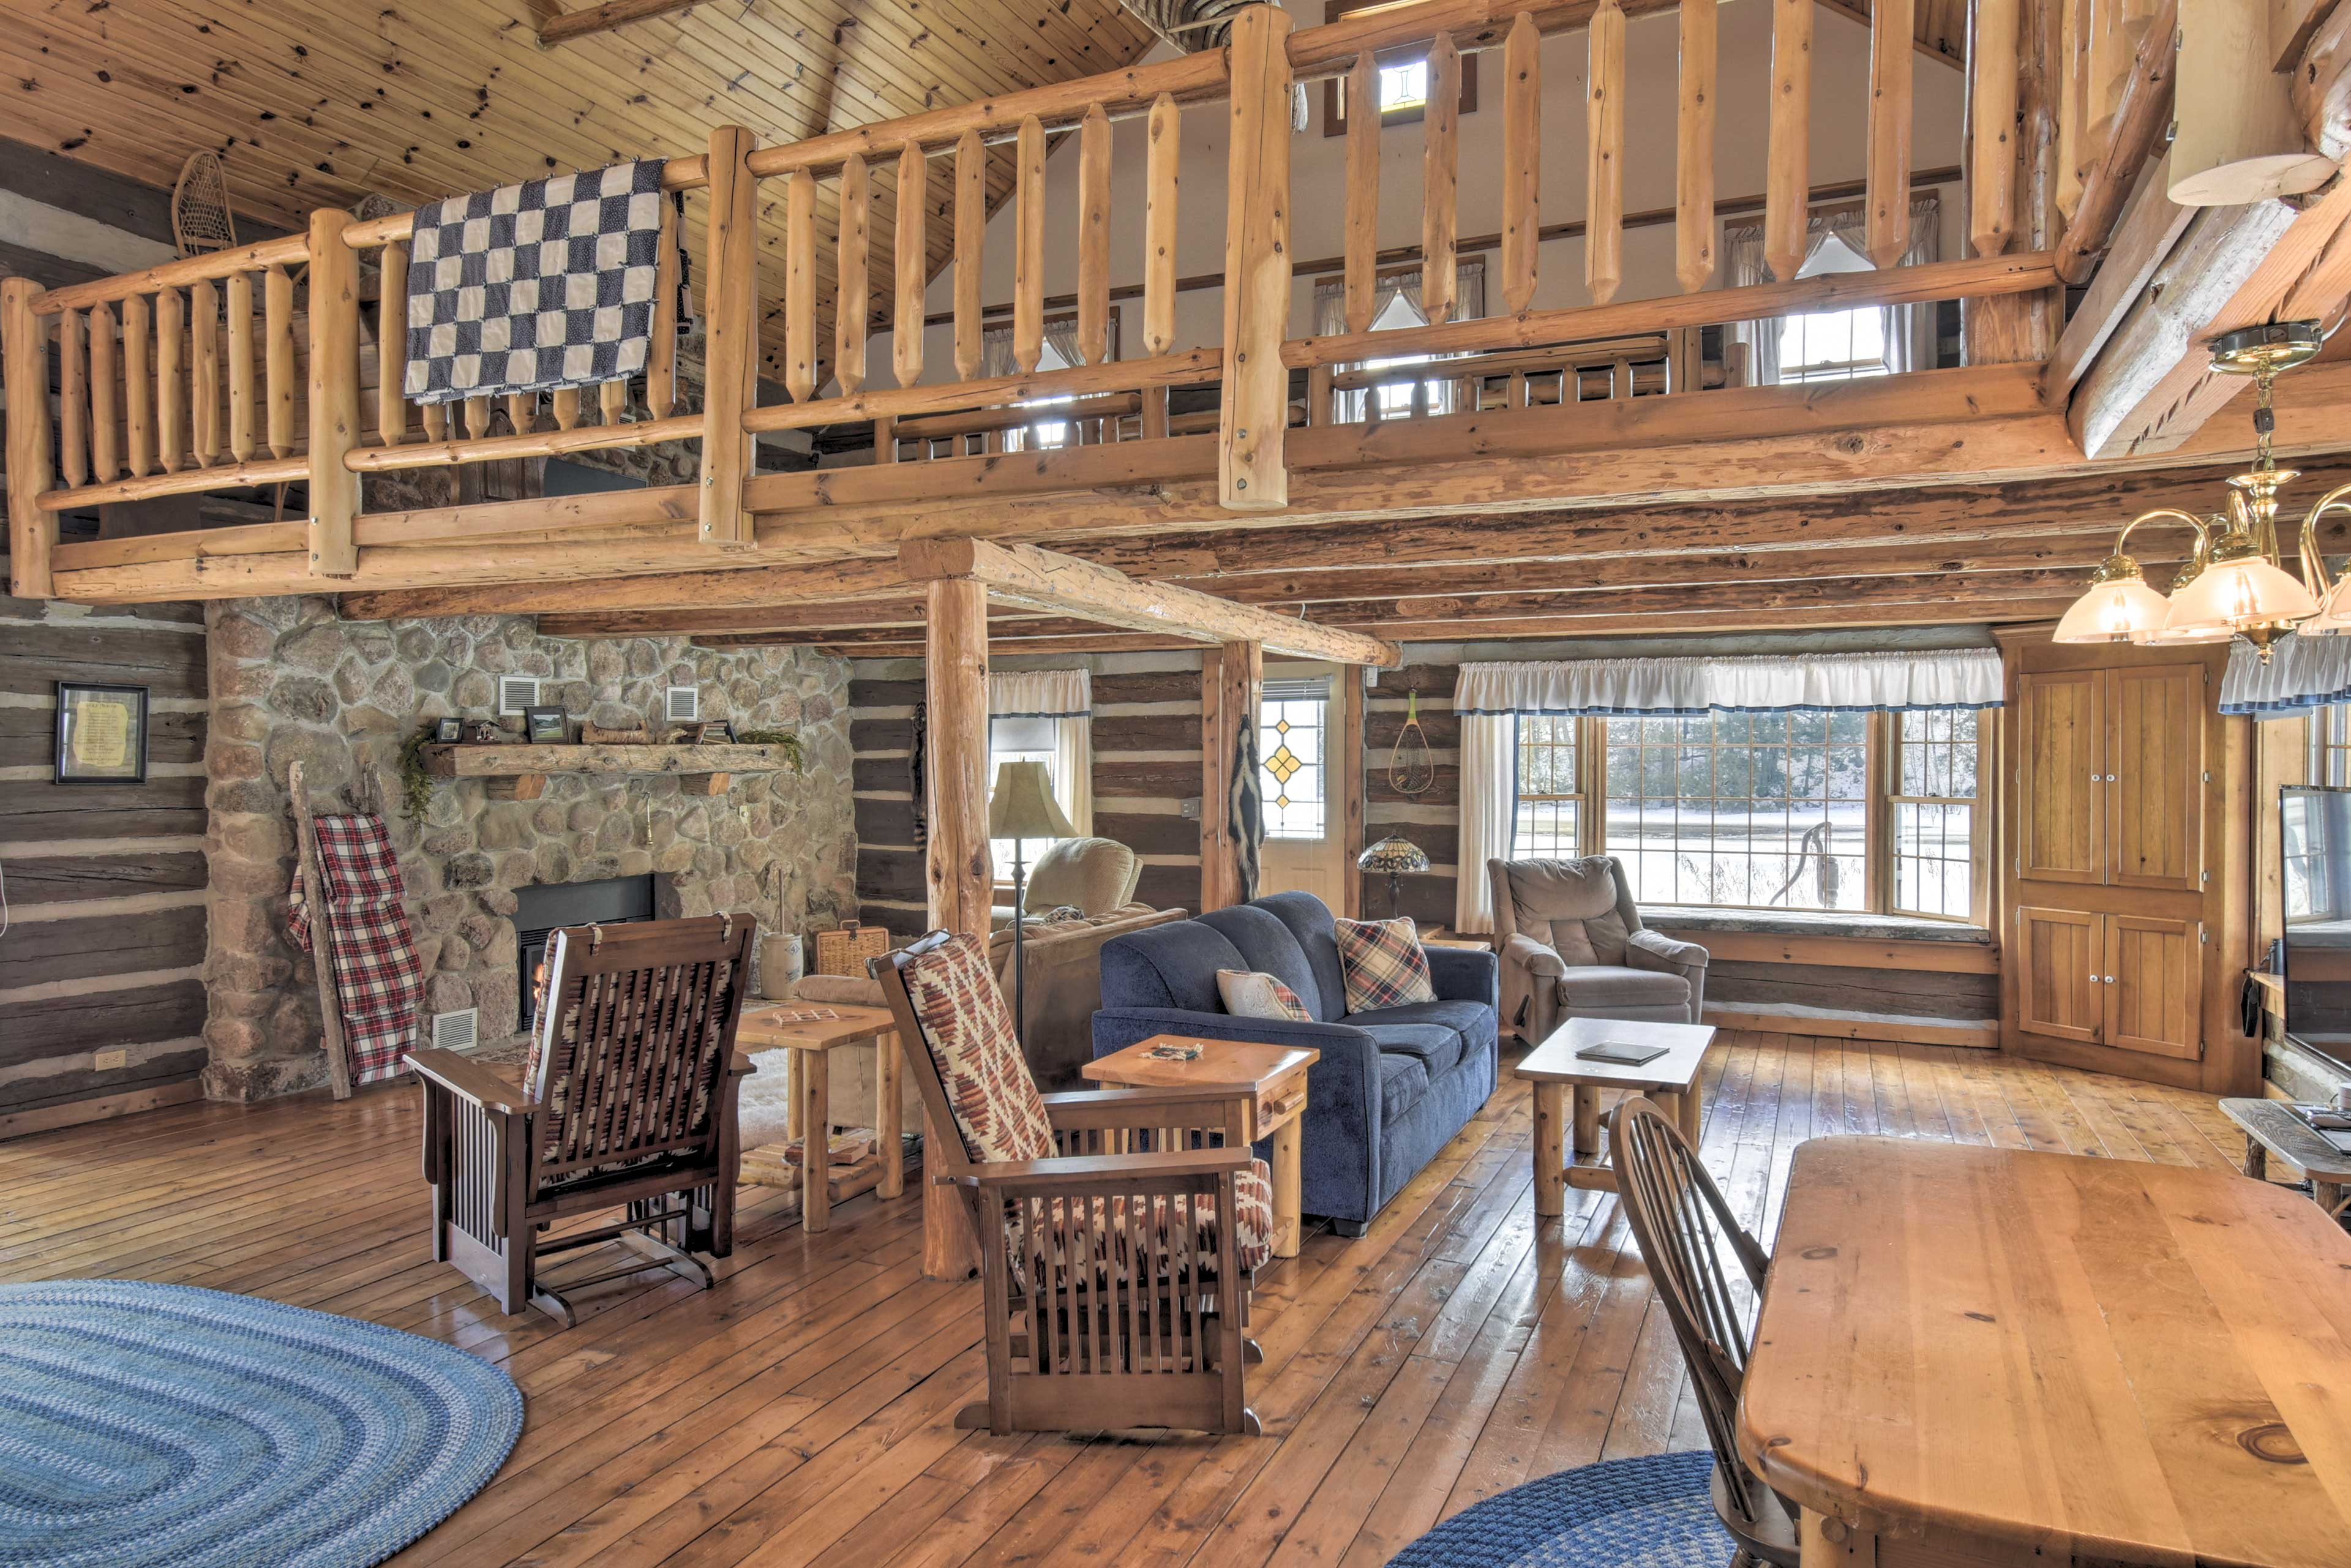 Hardwood floors span the expansive living area.